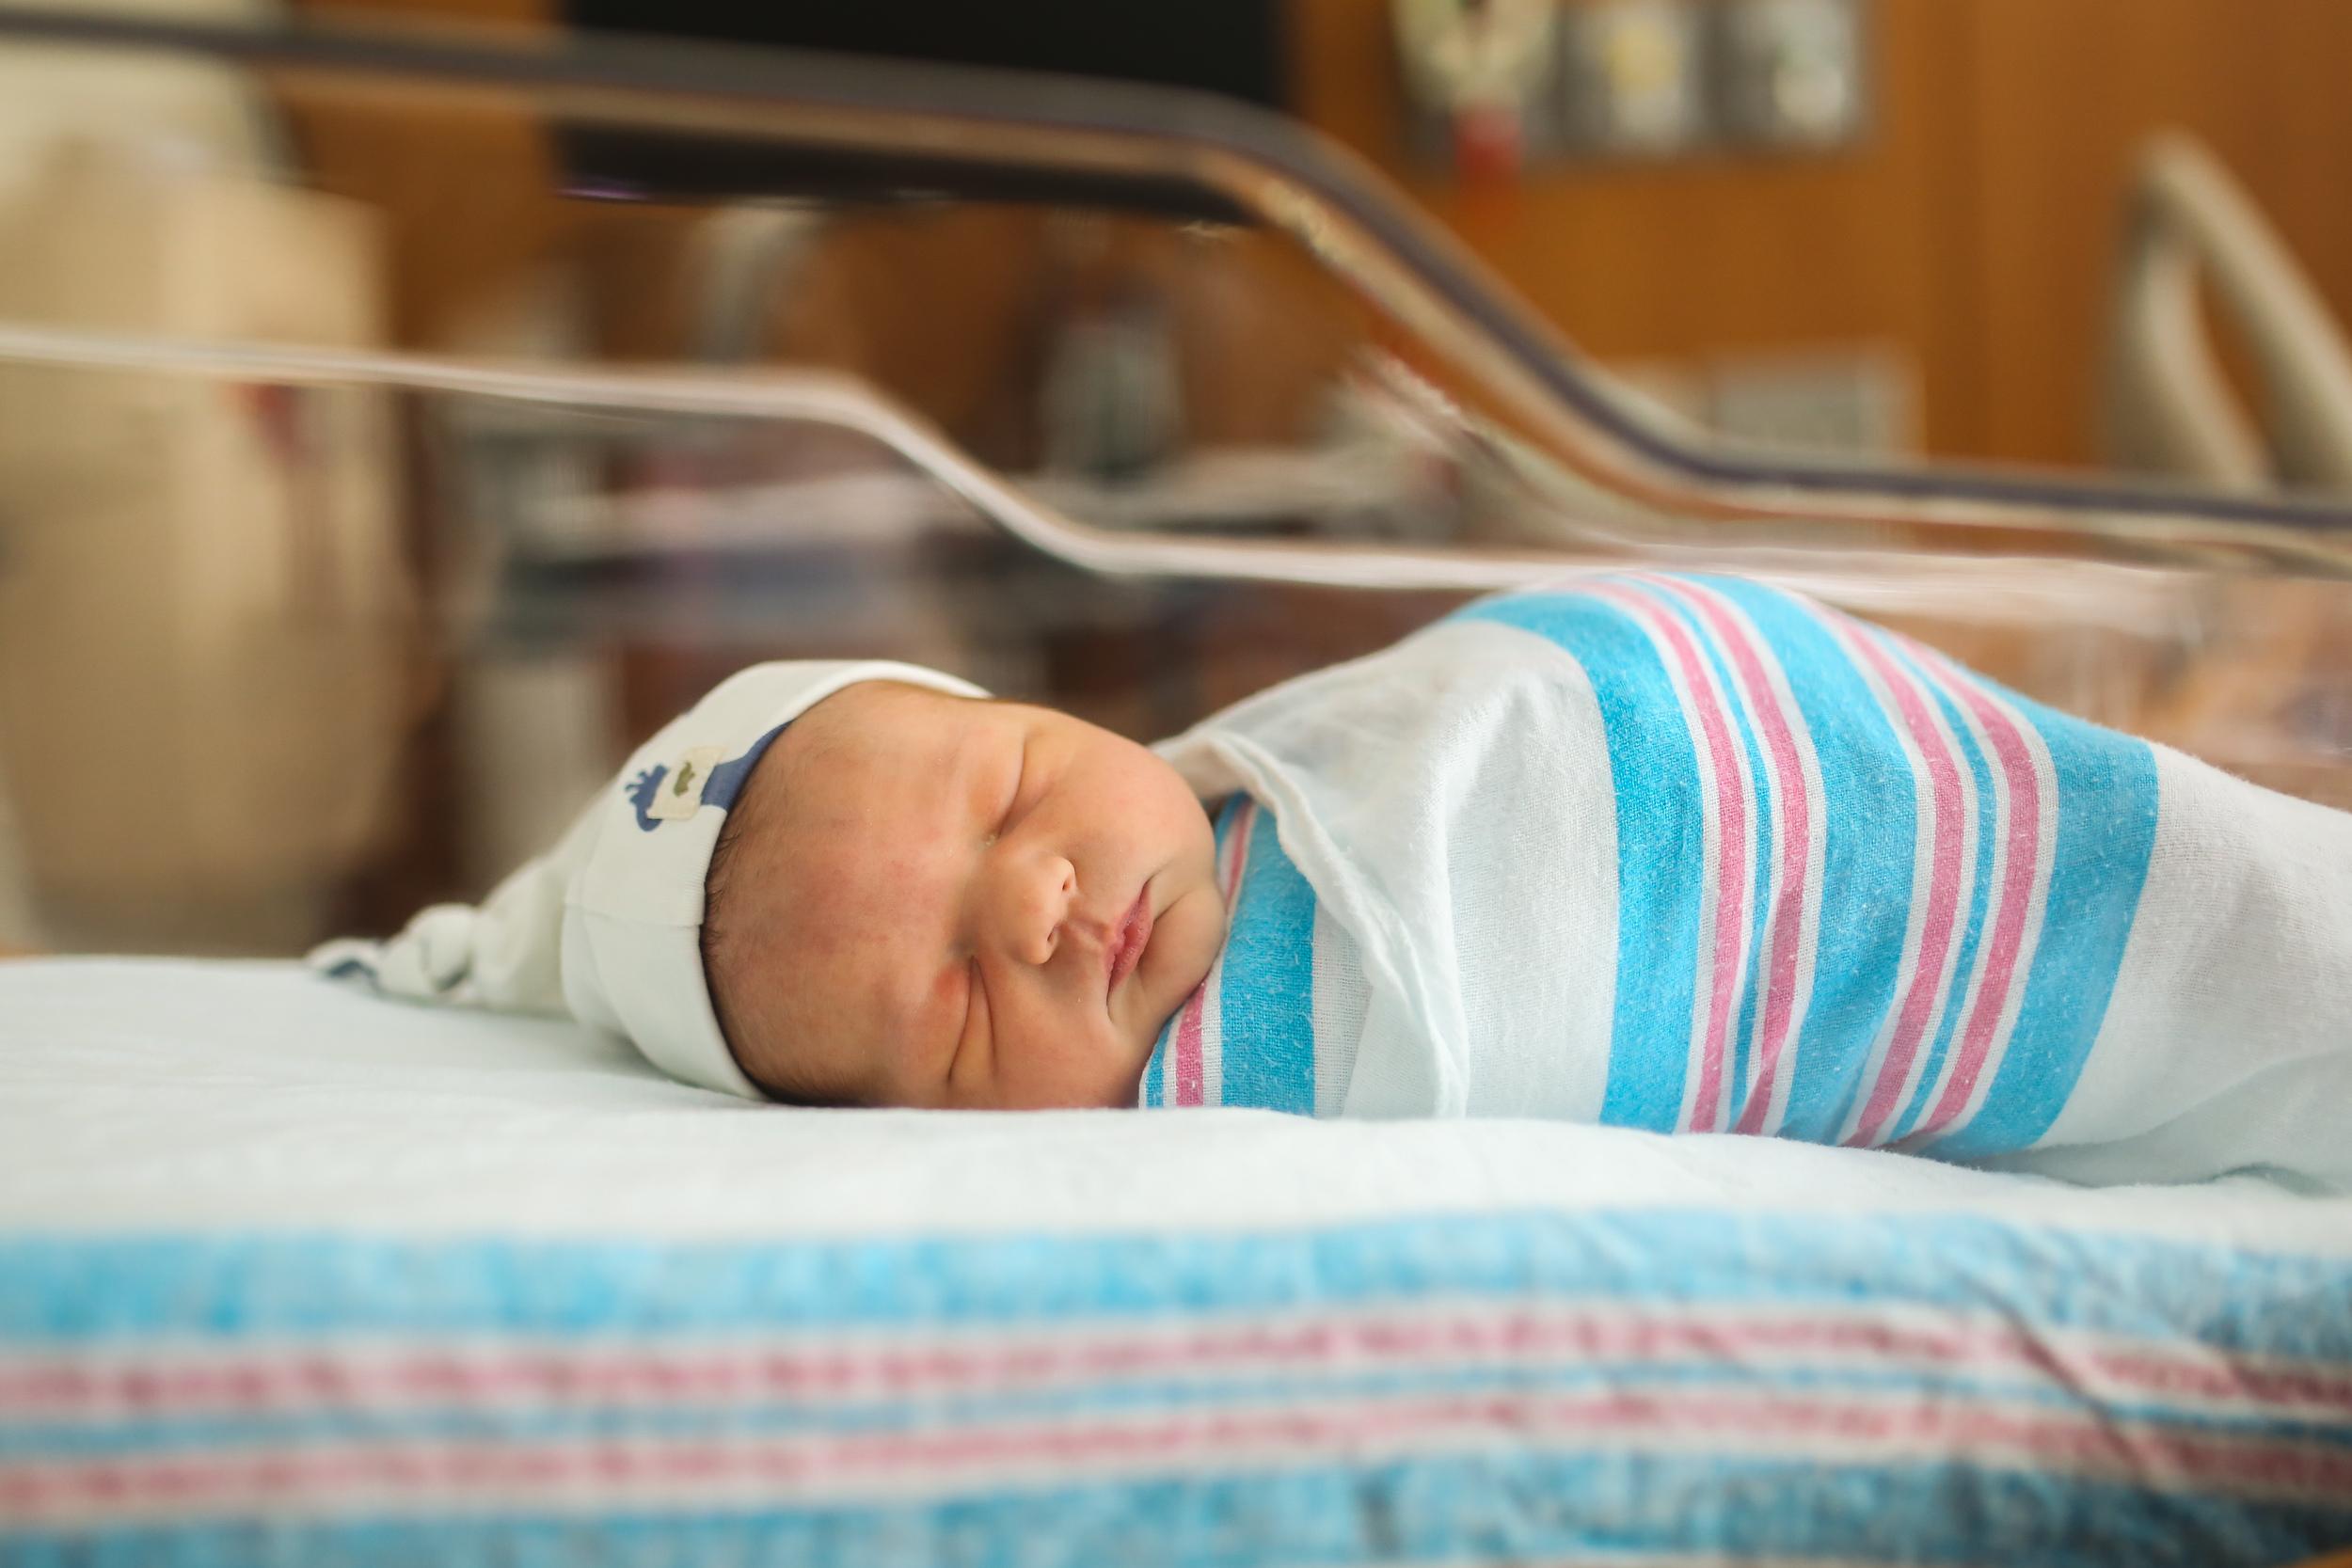 chicago newborn baby swaddled in hospital blanket